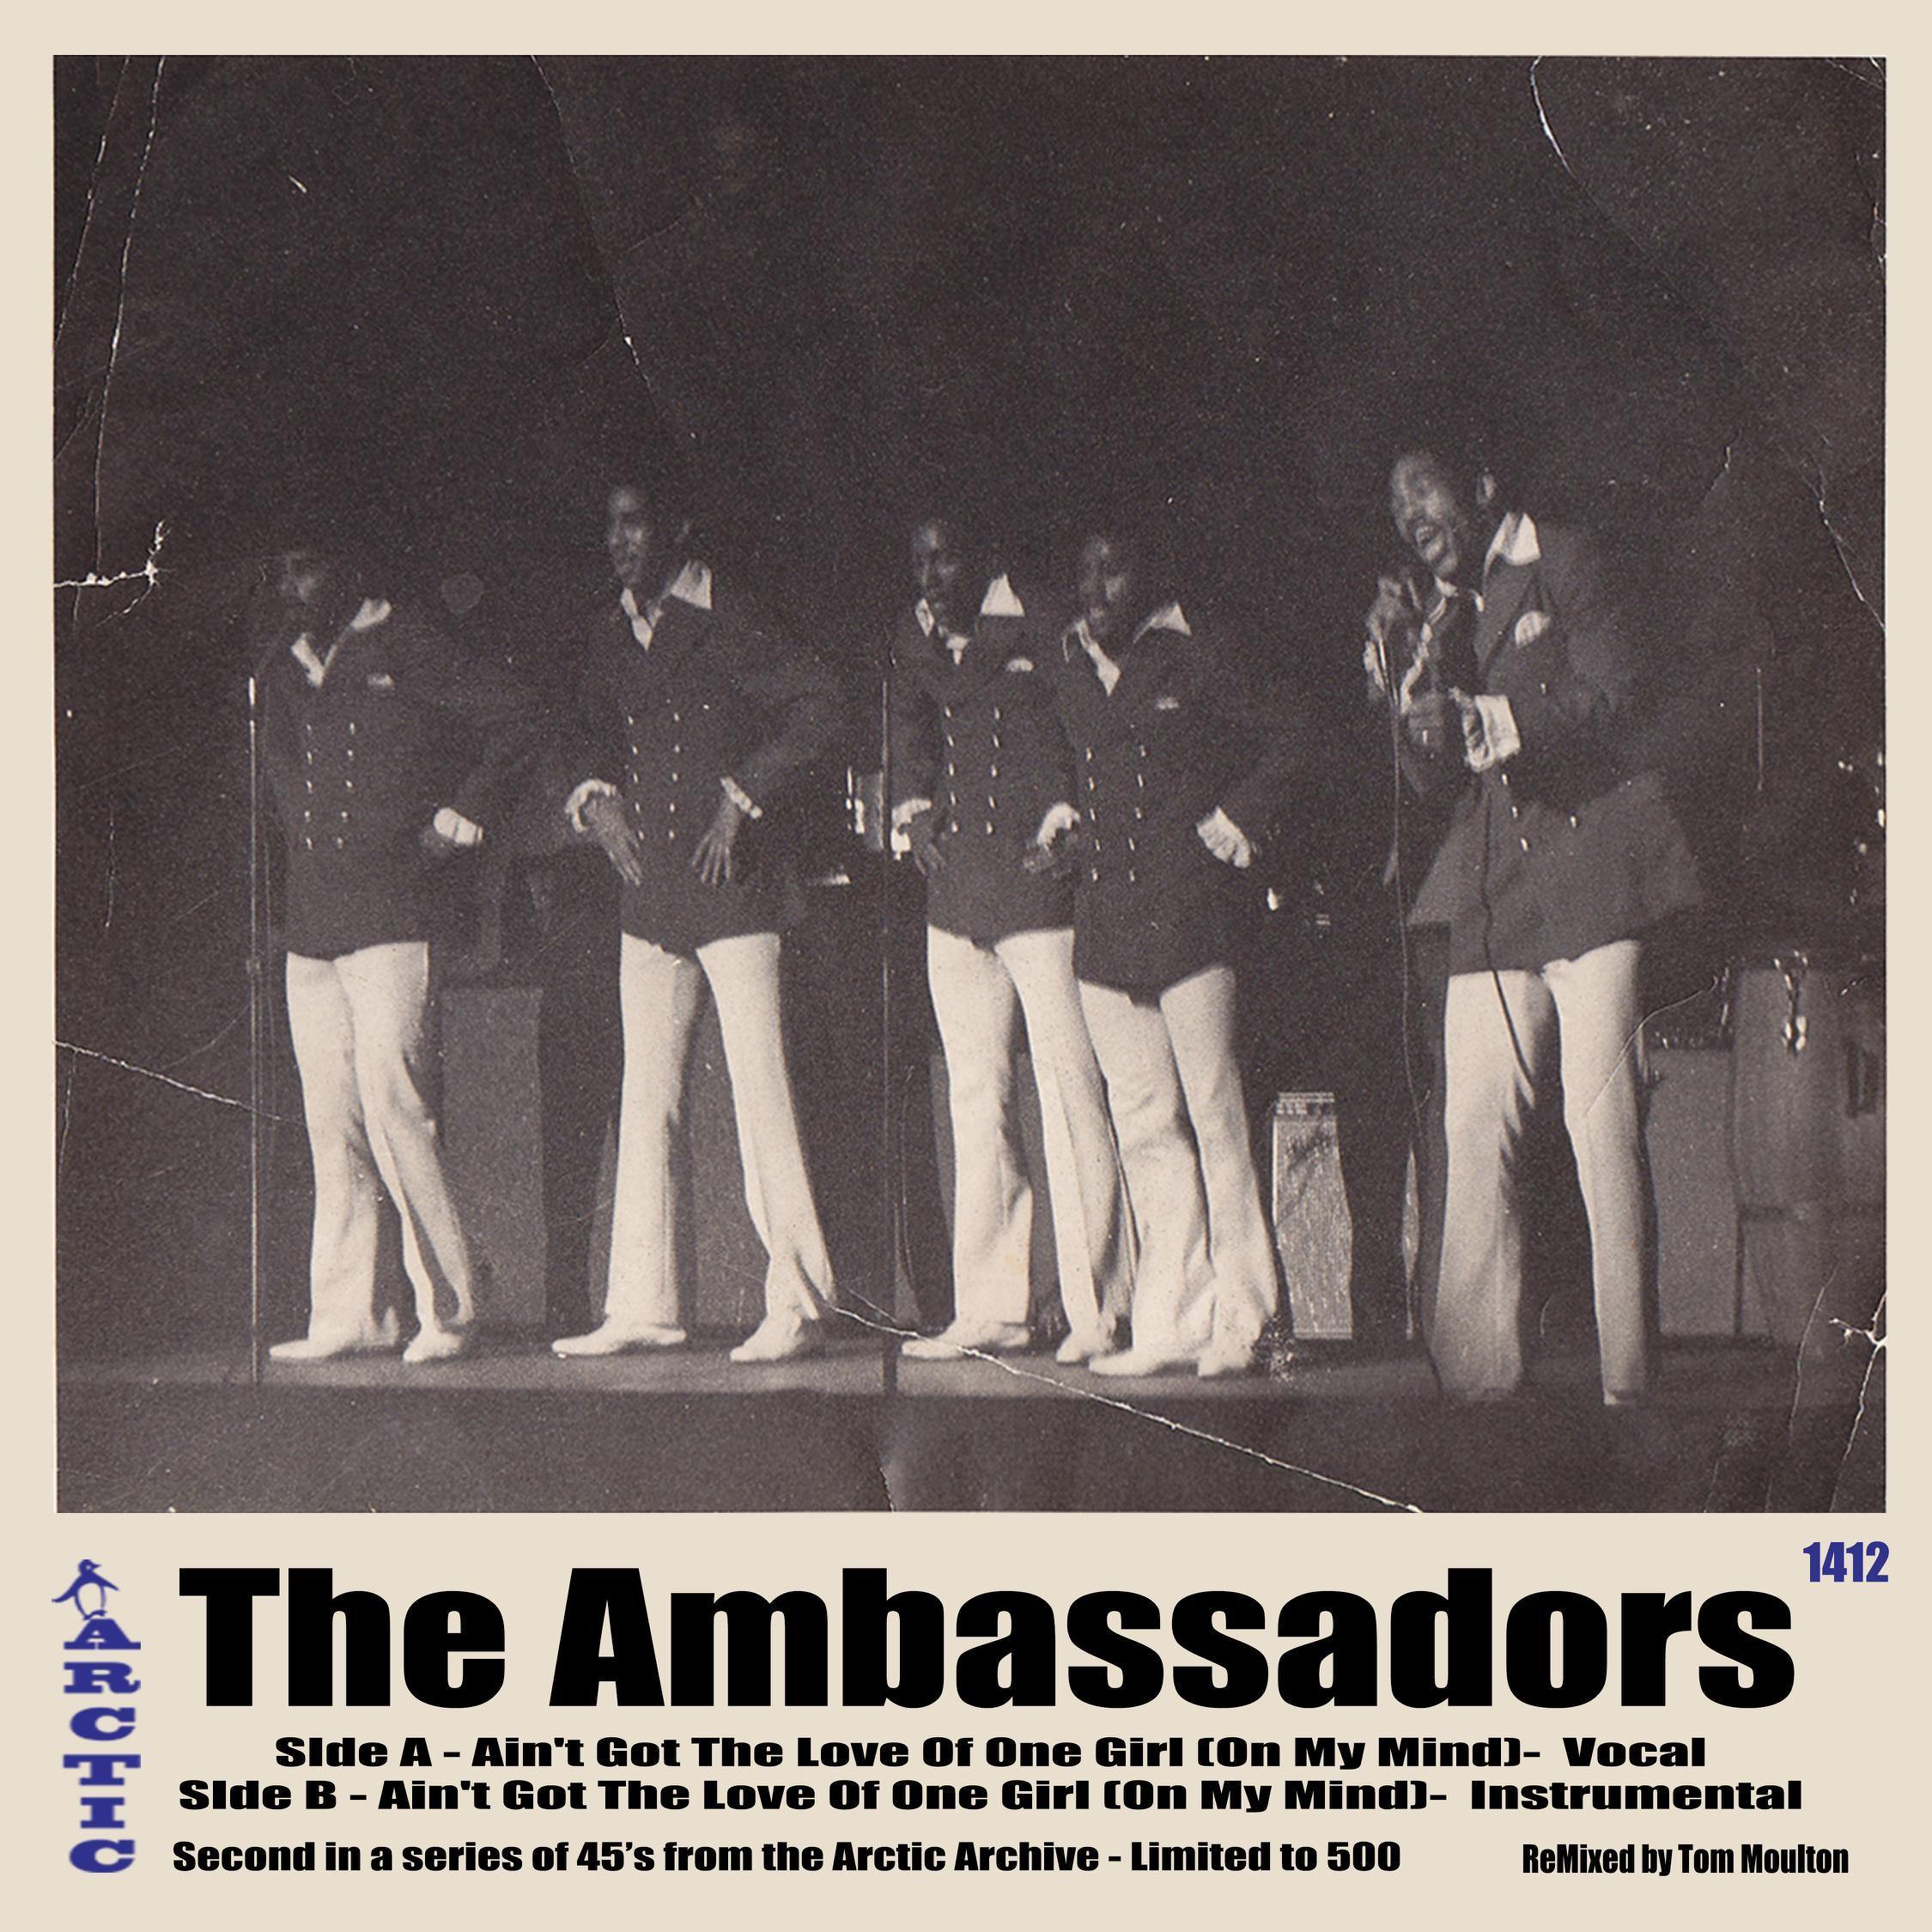 ambassadors7_new